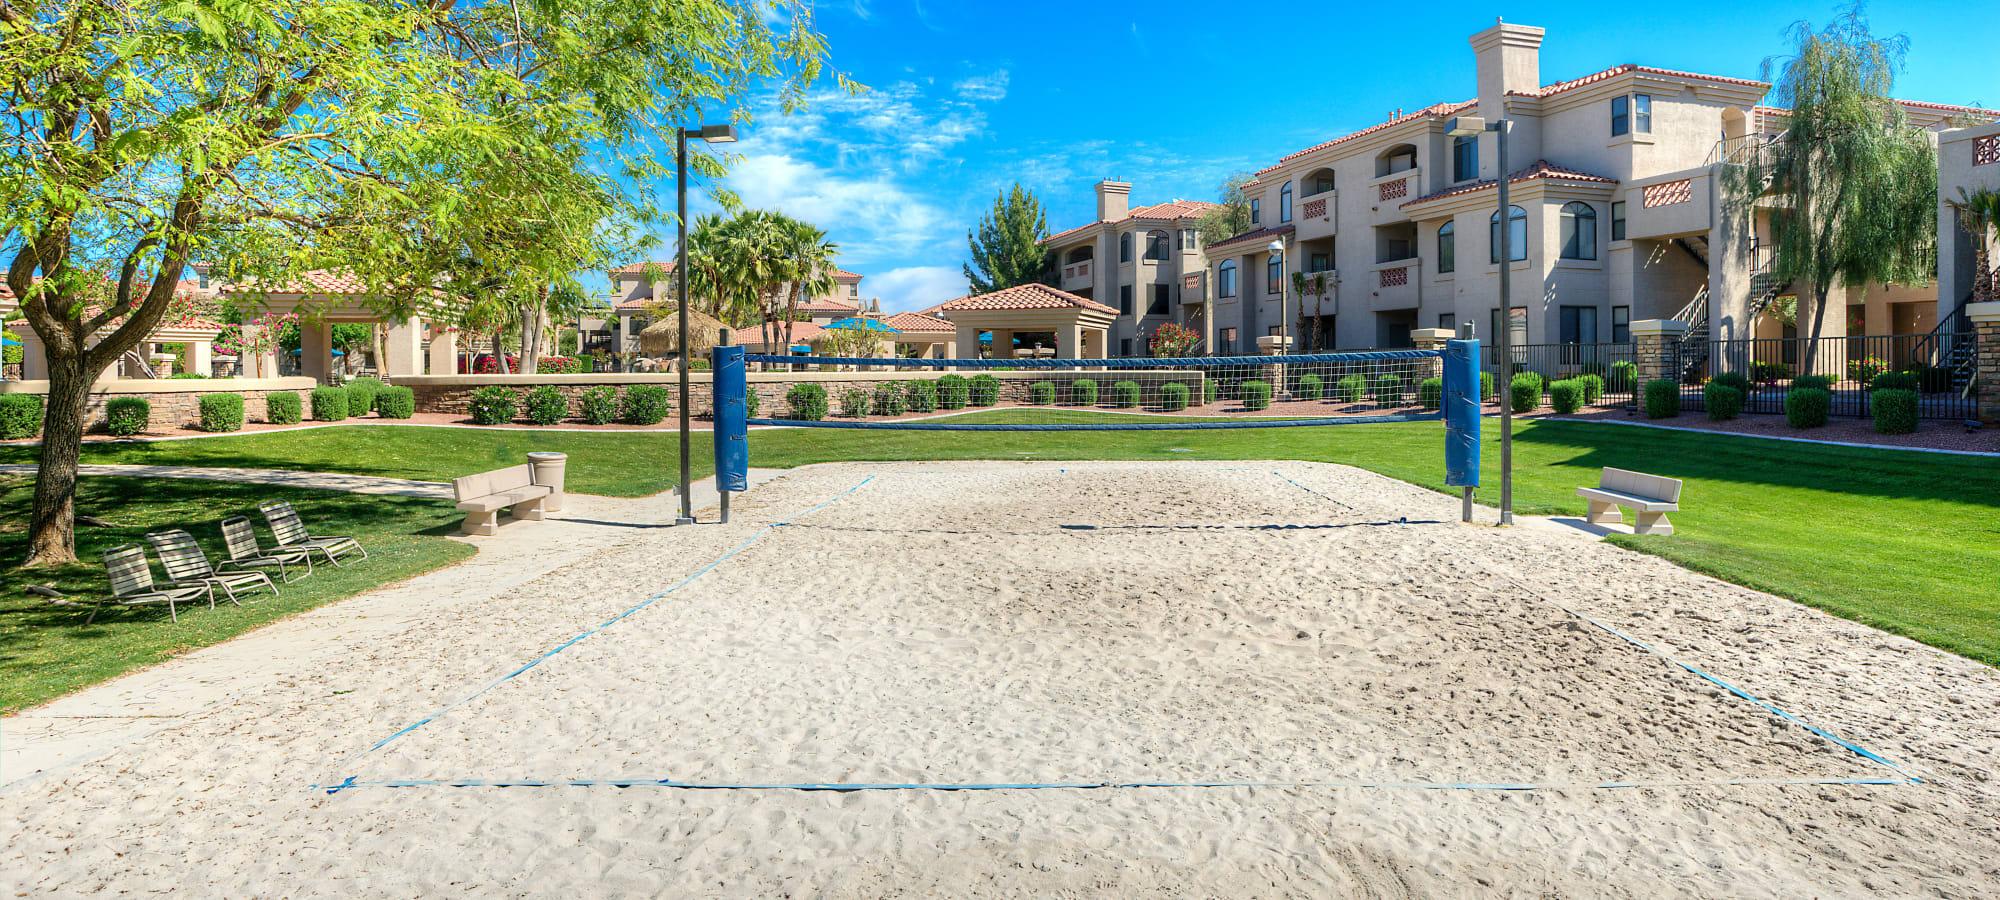 San volleyball court at San Pedregal in Phoenix, Arizona